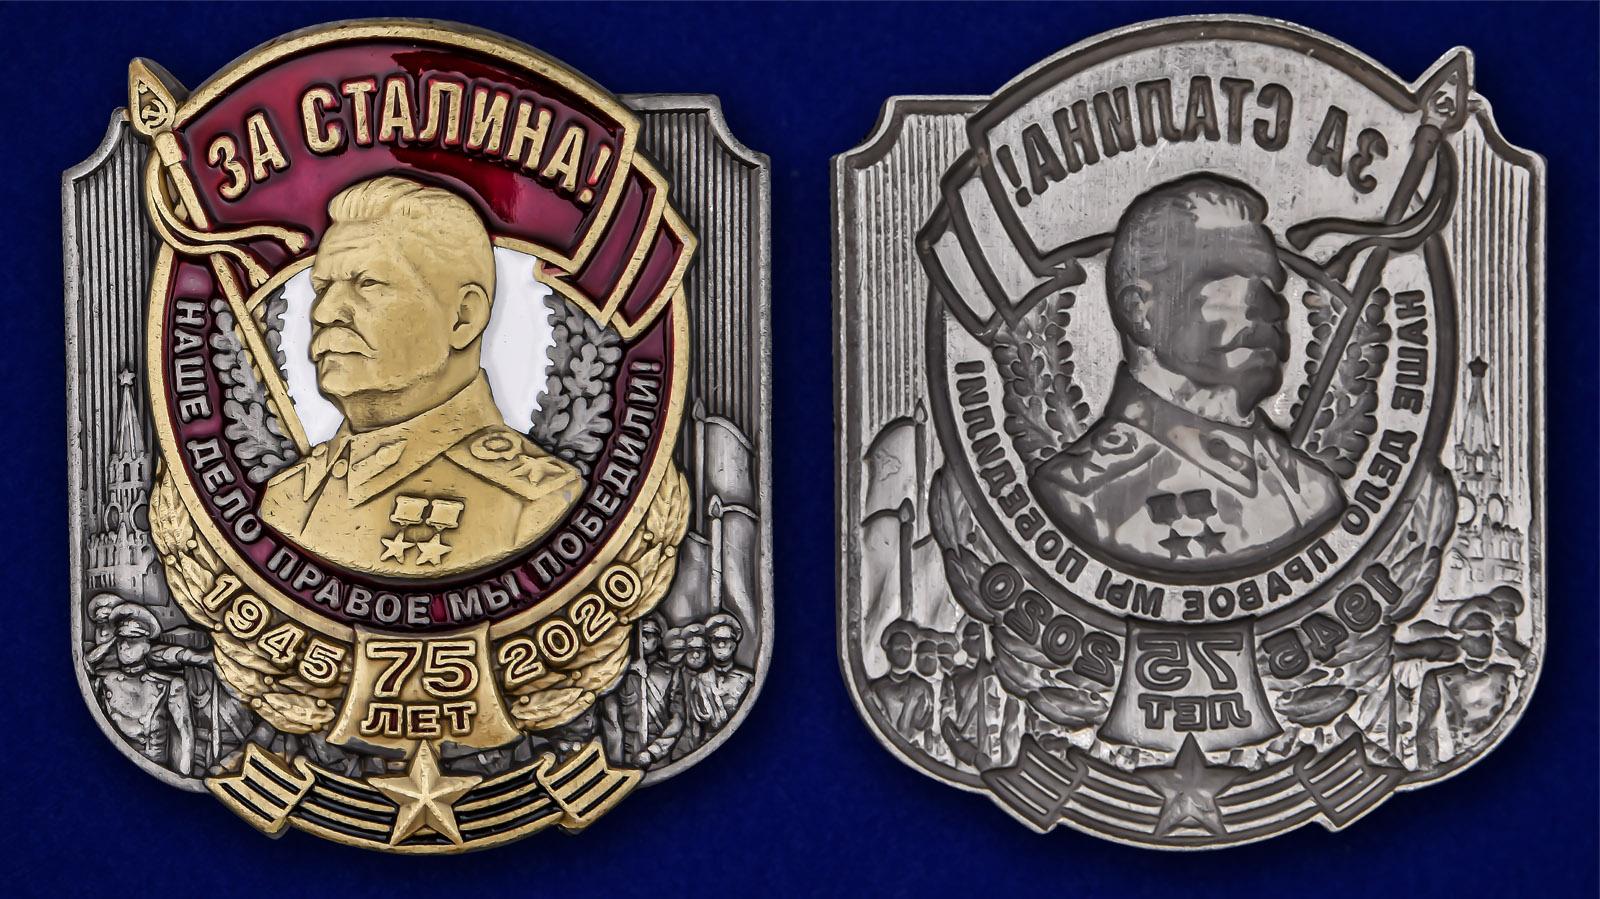 "Многоцелевая накладка ""За Сталина!"" - приемлемая цена"